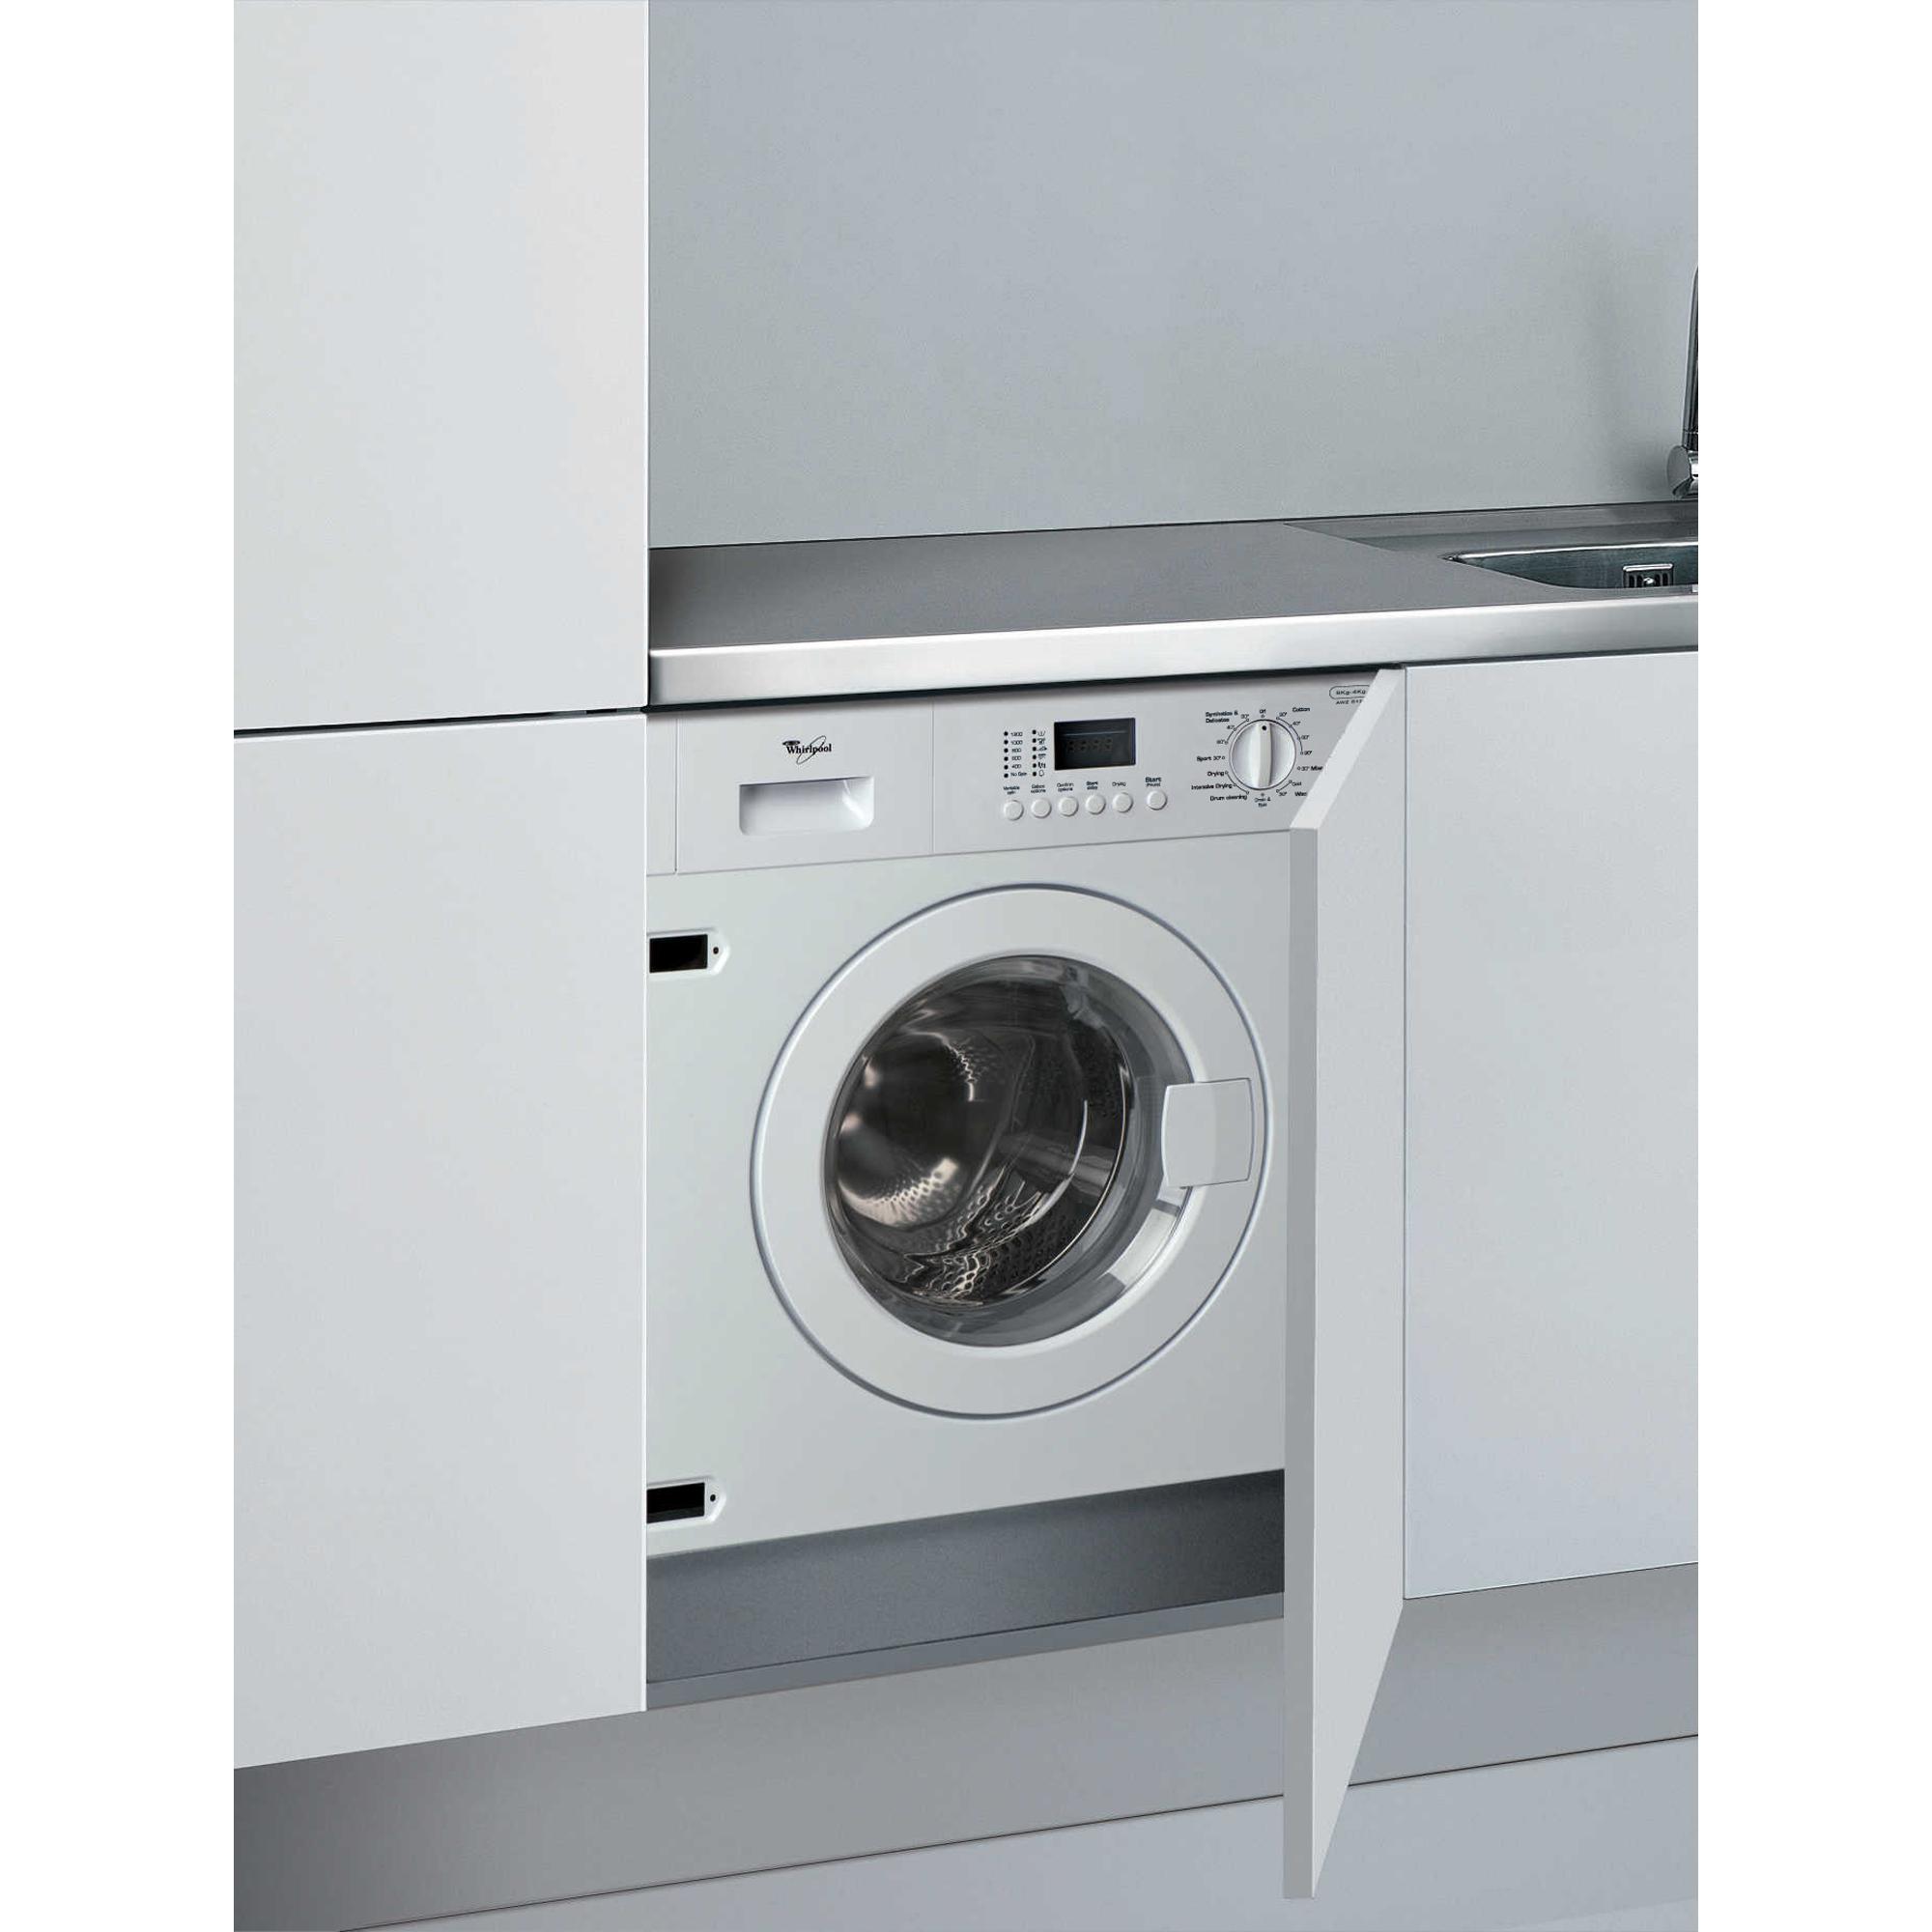 built in washer condenser dryer awz 612 whirlpool ireland. Black Bedroom Furniture Sets. Home Design Ideas